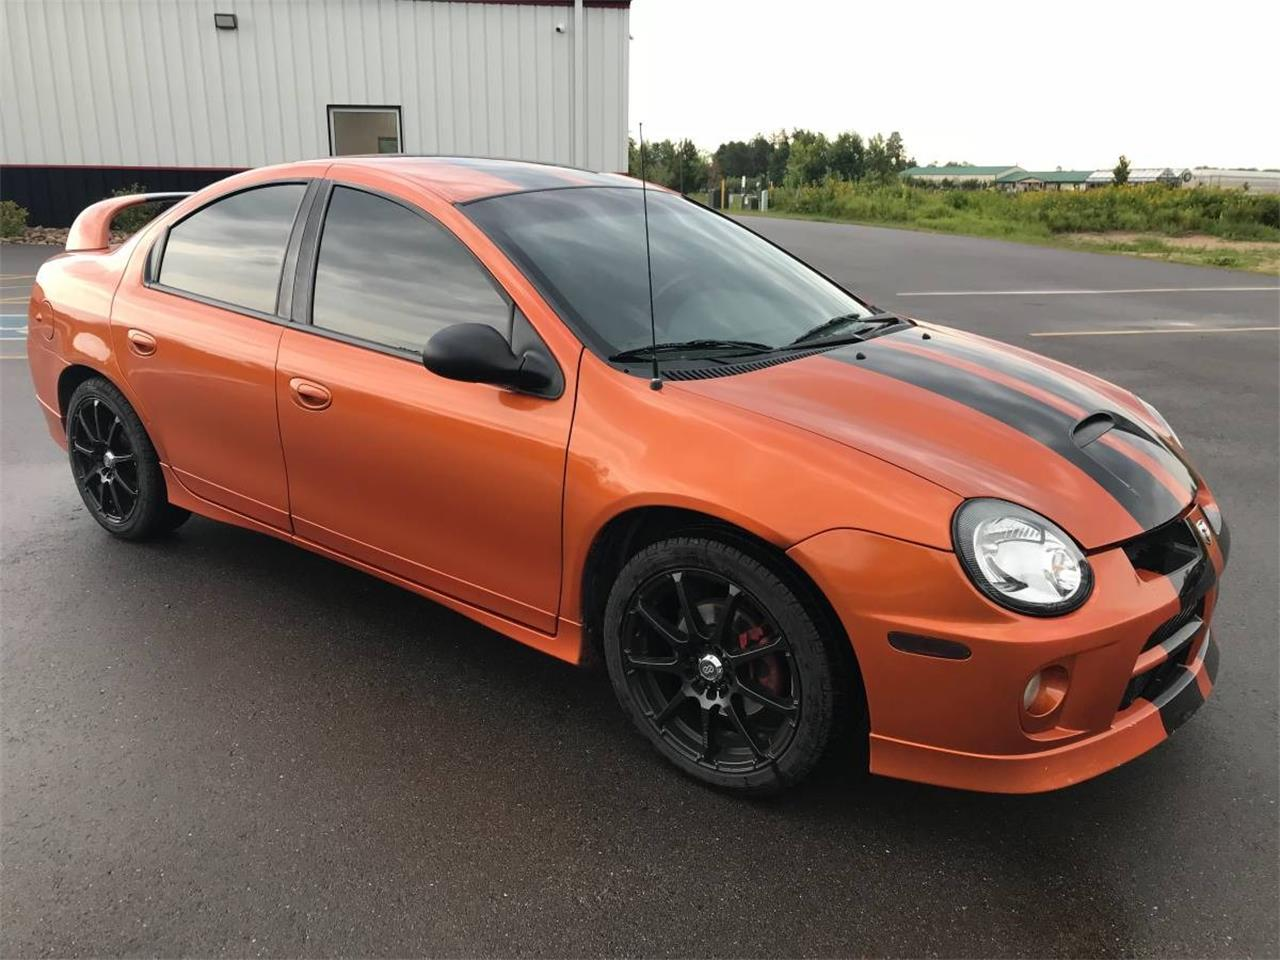 2004 Dodge Neon For Sale Classiccars Com Cc 1130657